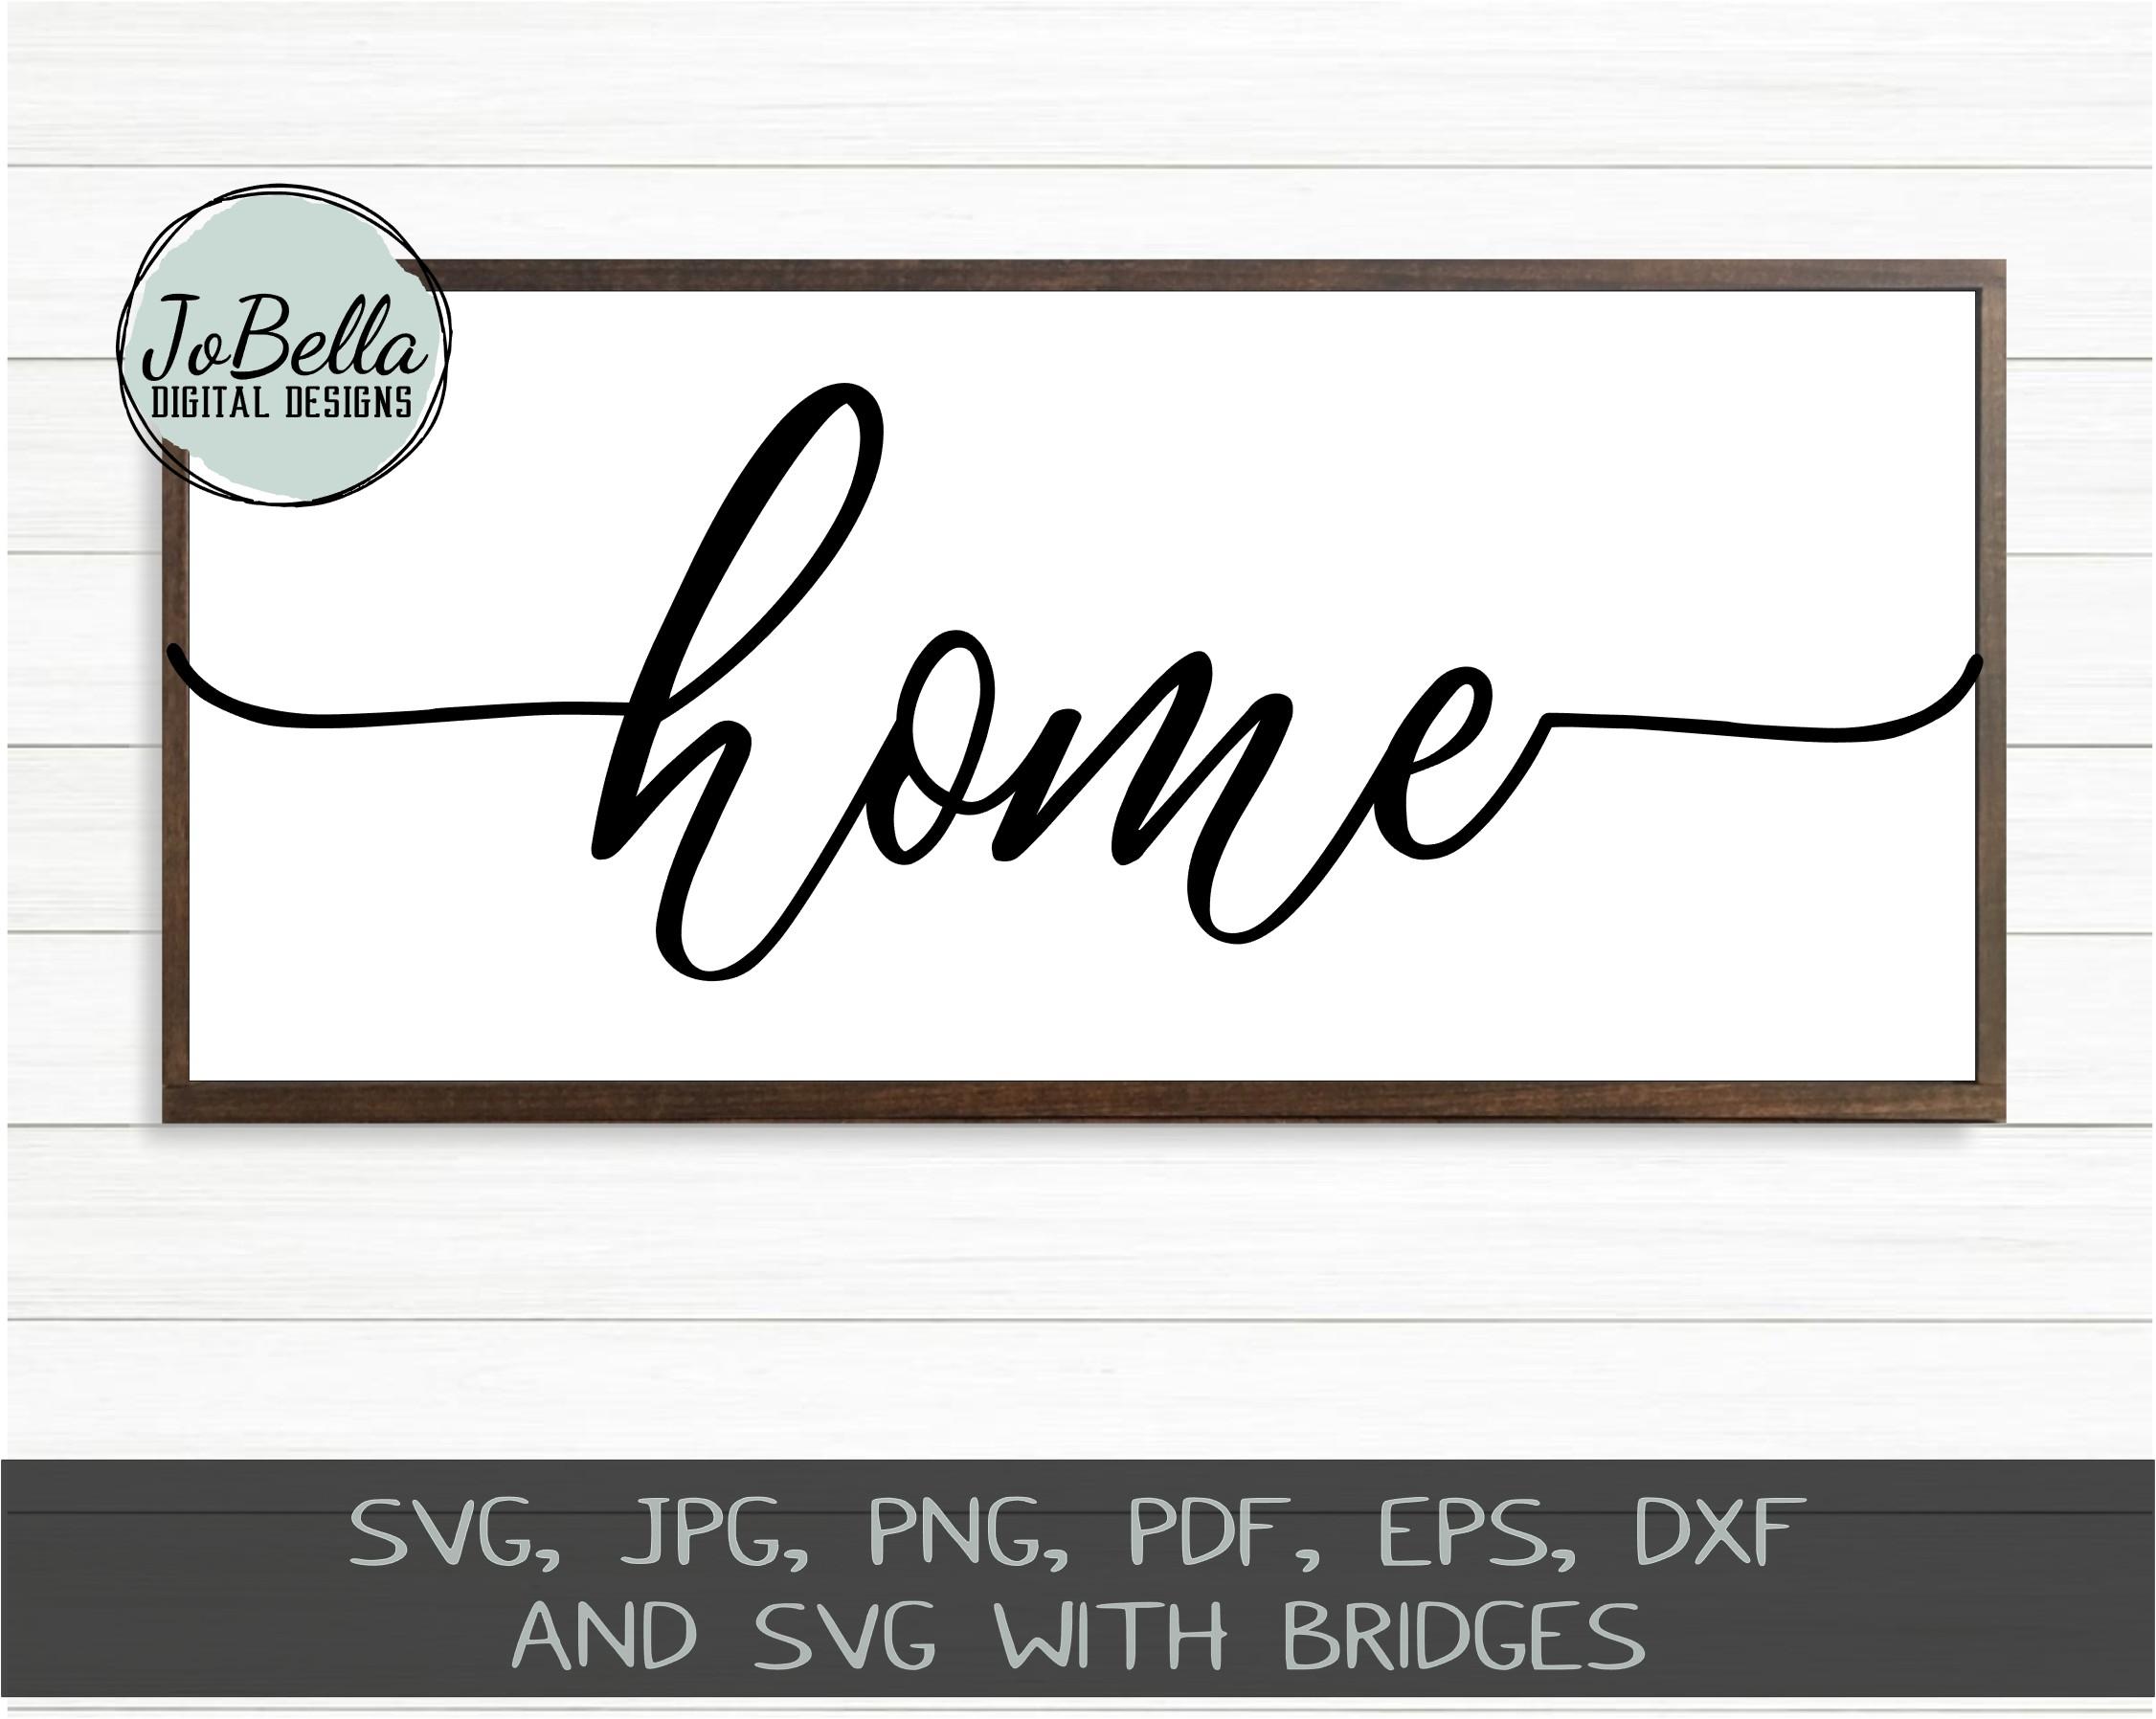 Home Wood Sign SVG Bundle - Farmhouse SVG Bundle example image 7